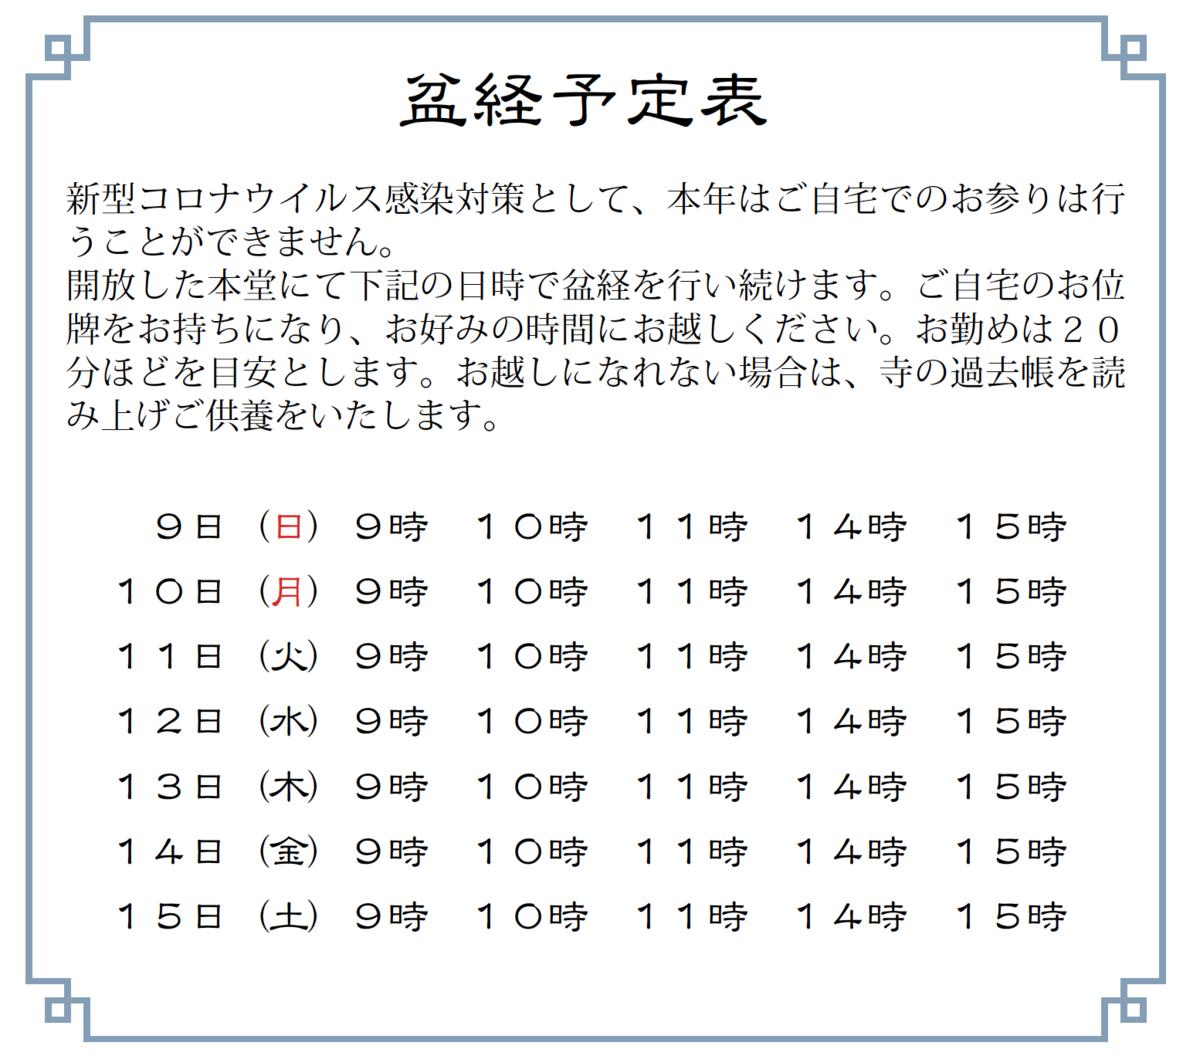 f:id:tozenji:20200727154605p:plain